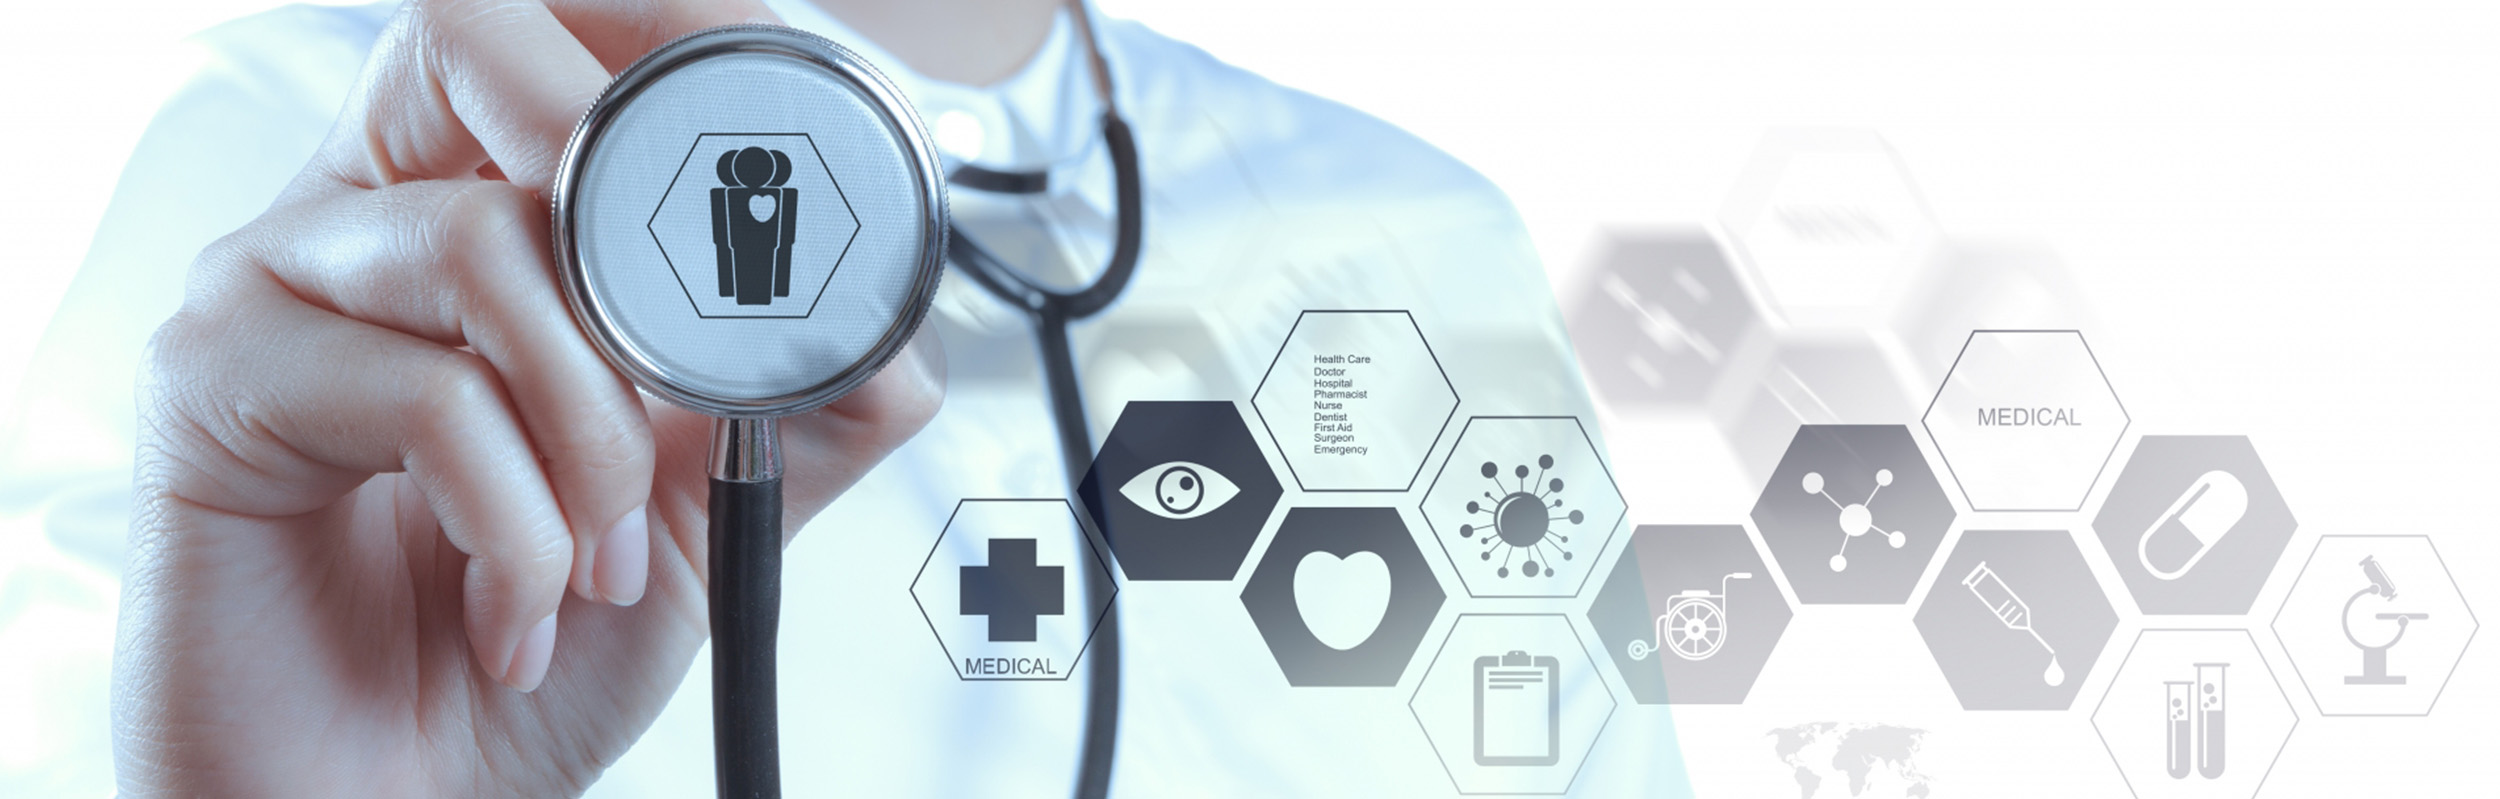 about - obmedics